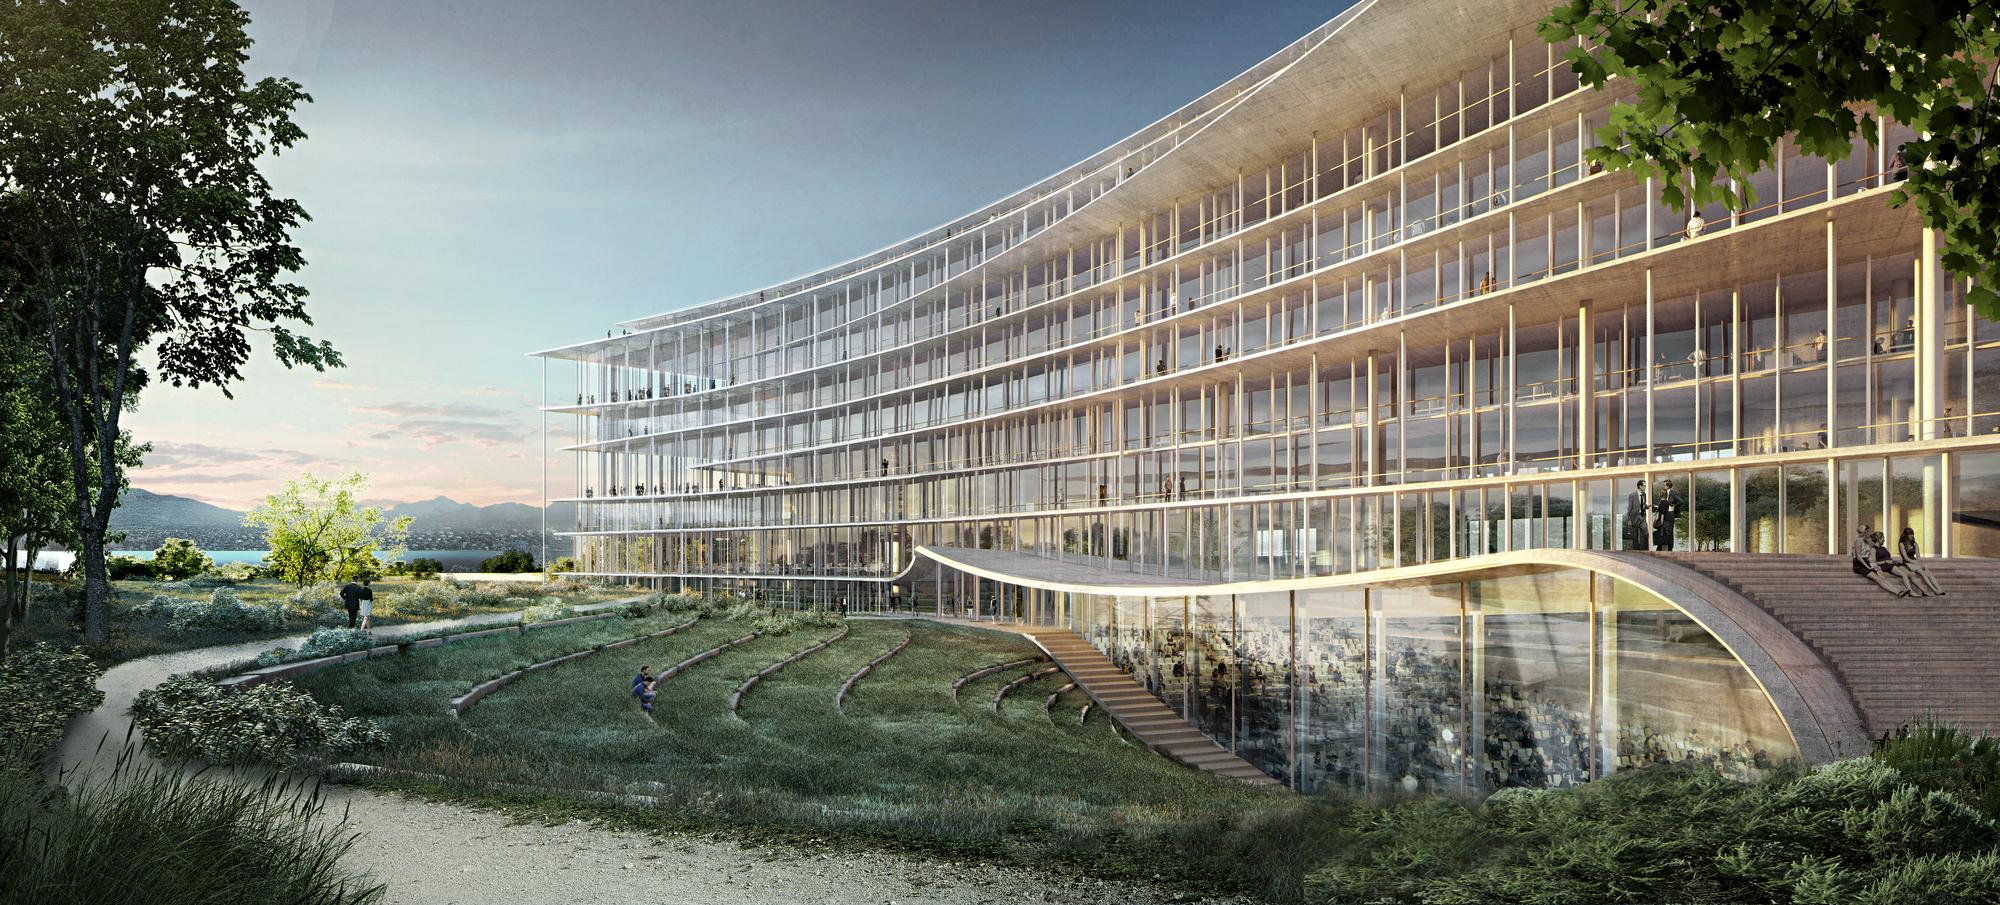 Herzog de meuron wins competition for swiss bank for Architecture suisse